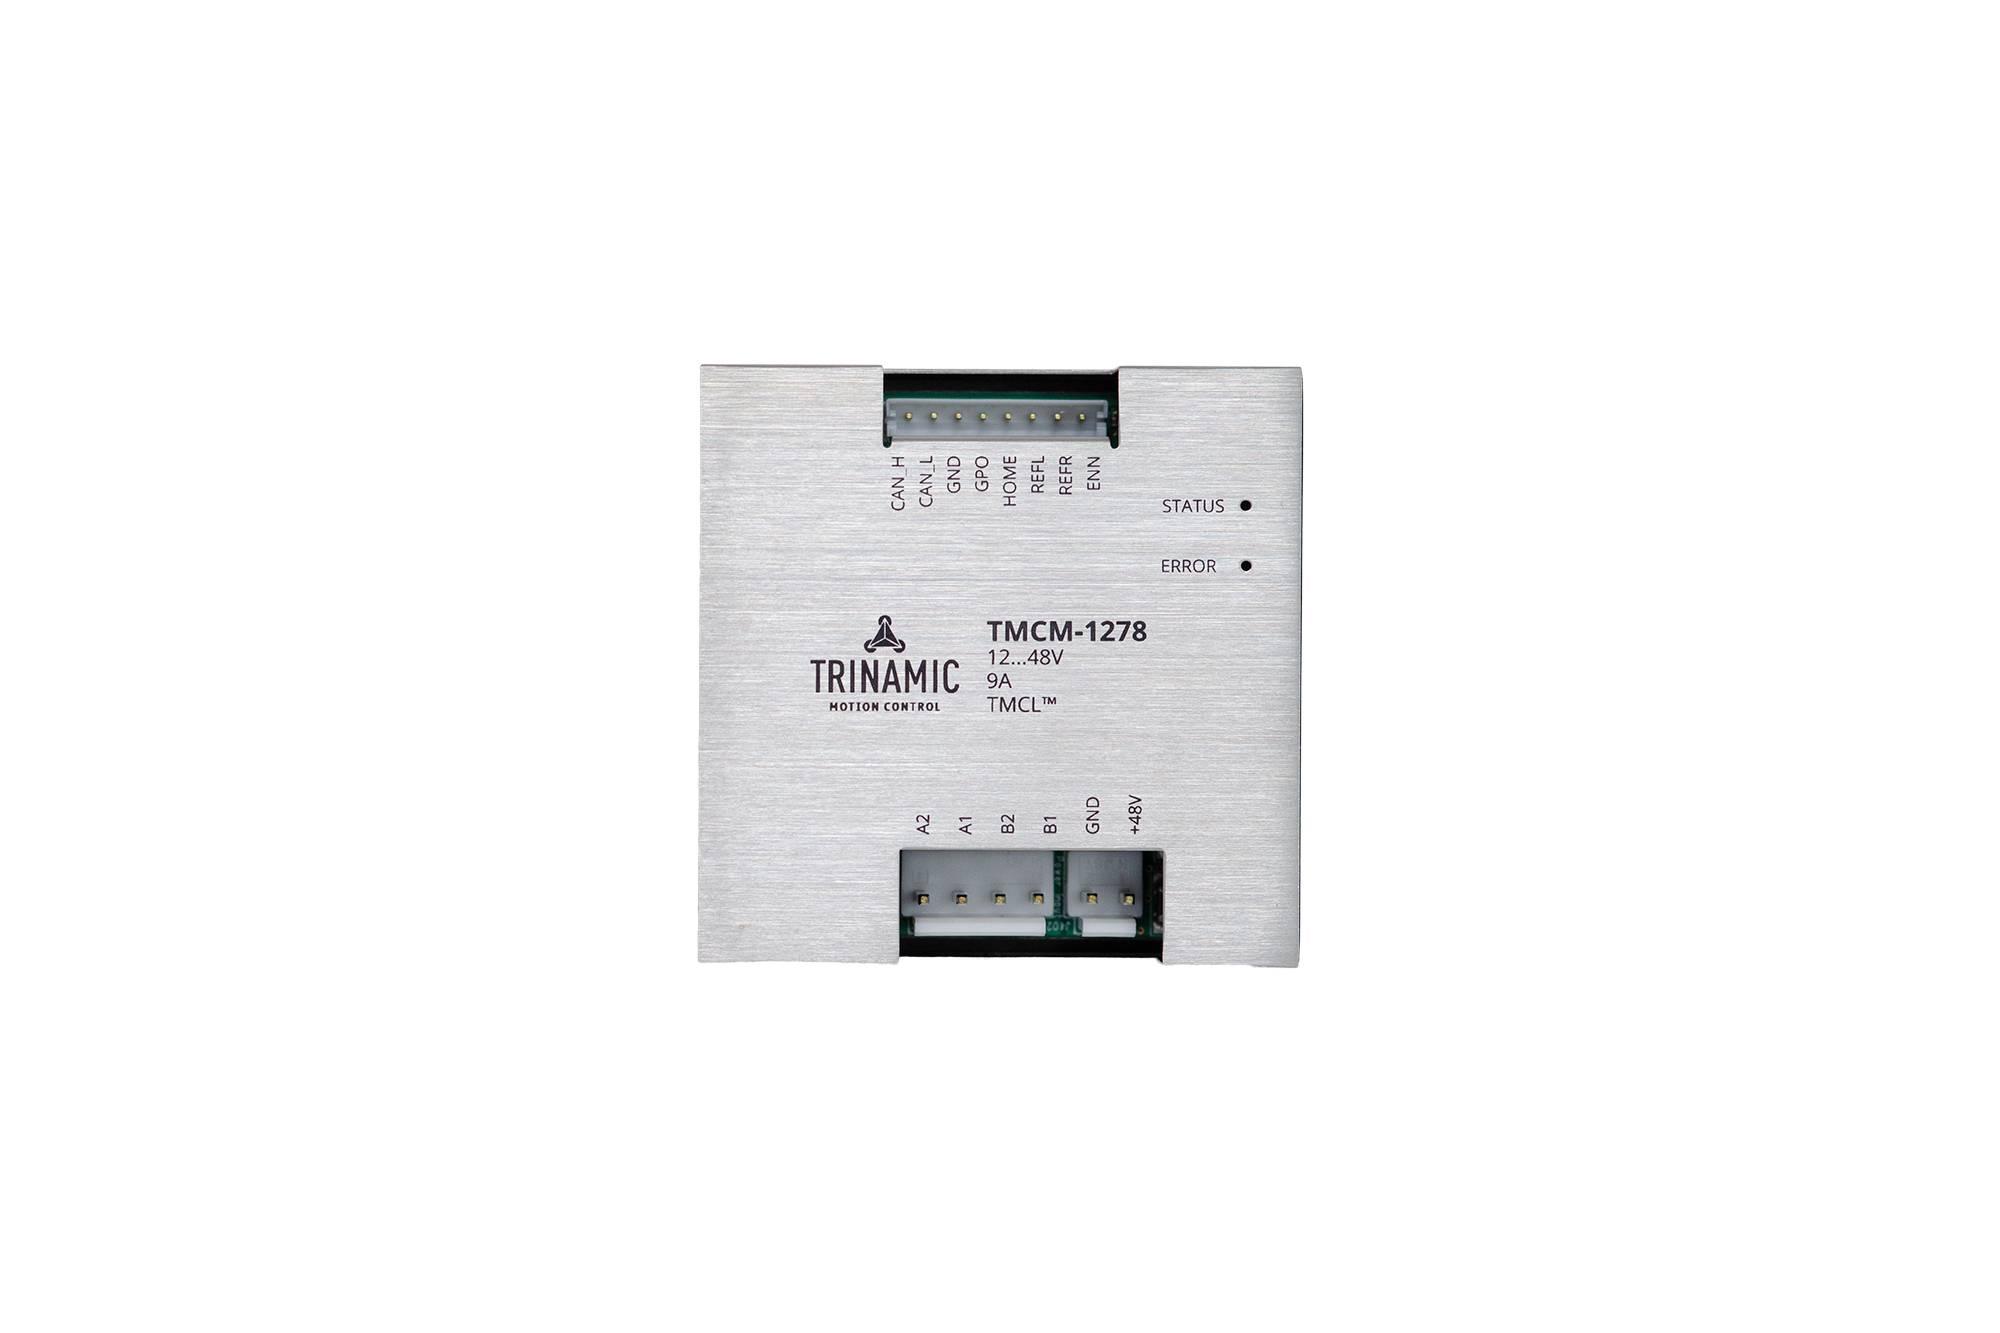 TMCM-1278-TMCL